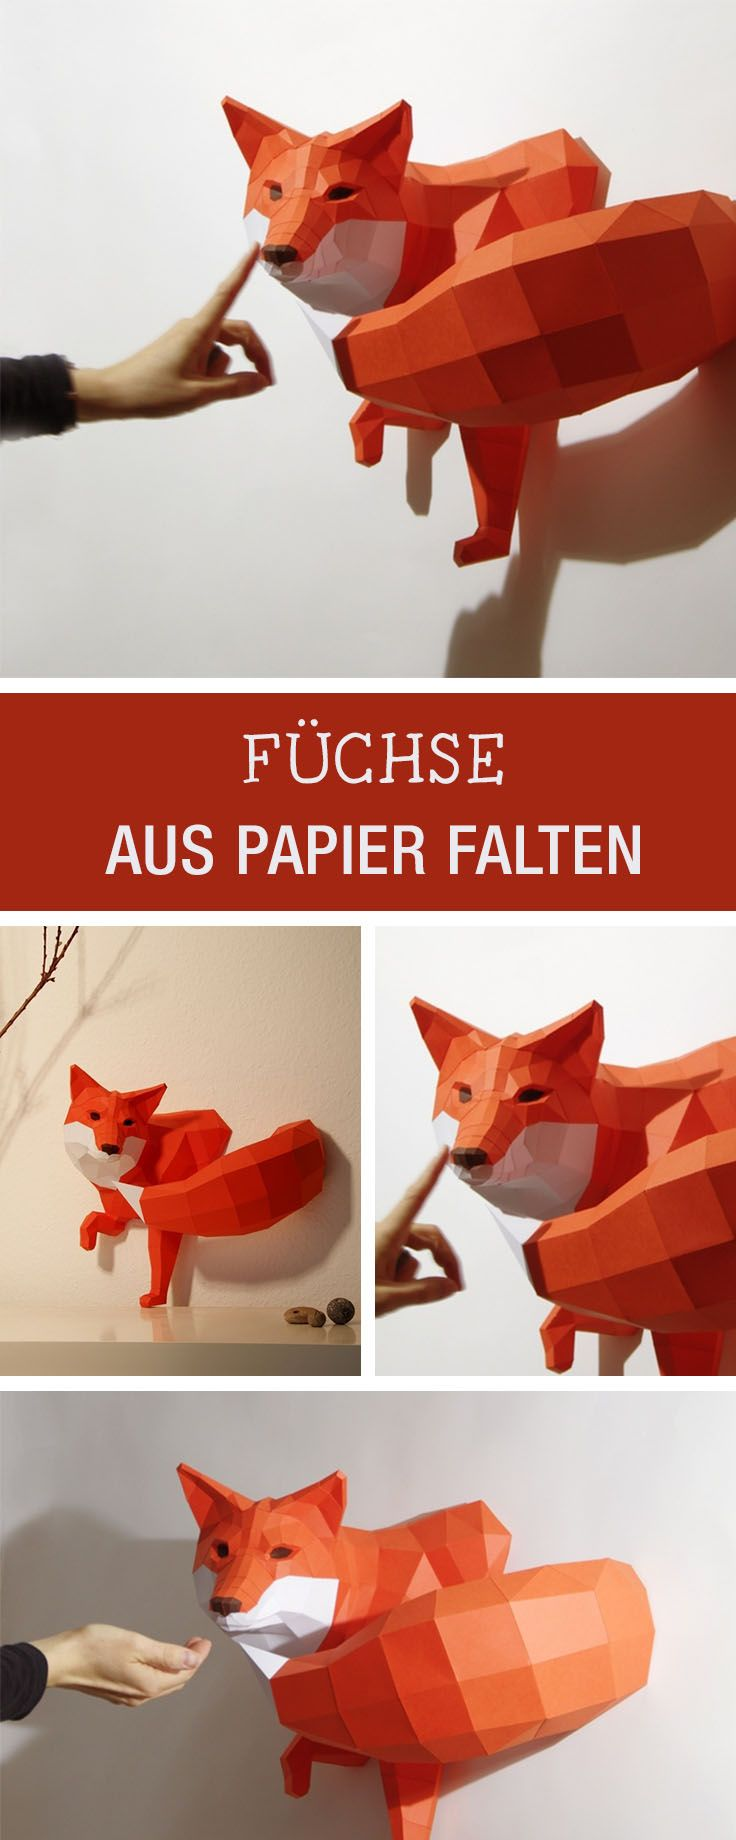 hight resolution of diy f r einen origami fuchs als originelle wohndeko craft an origami fox made of paper home decor via dawanda com